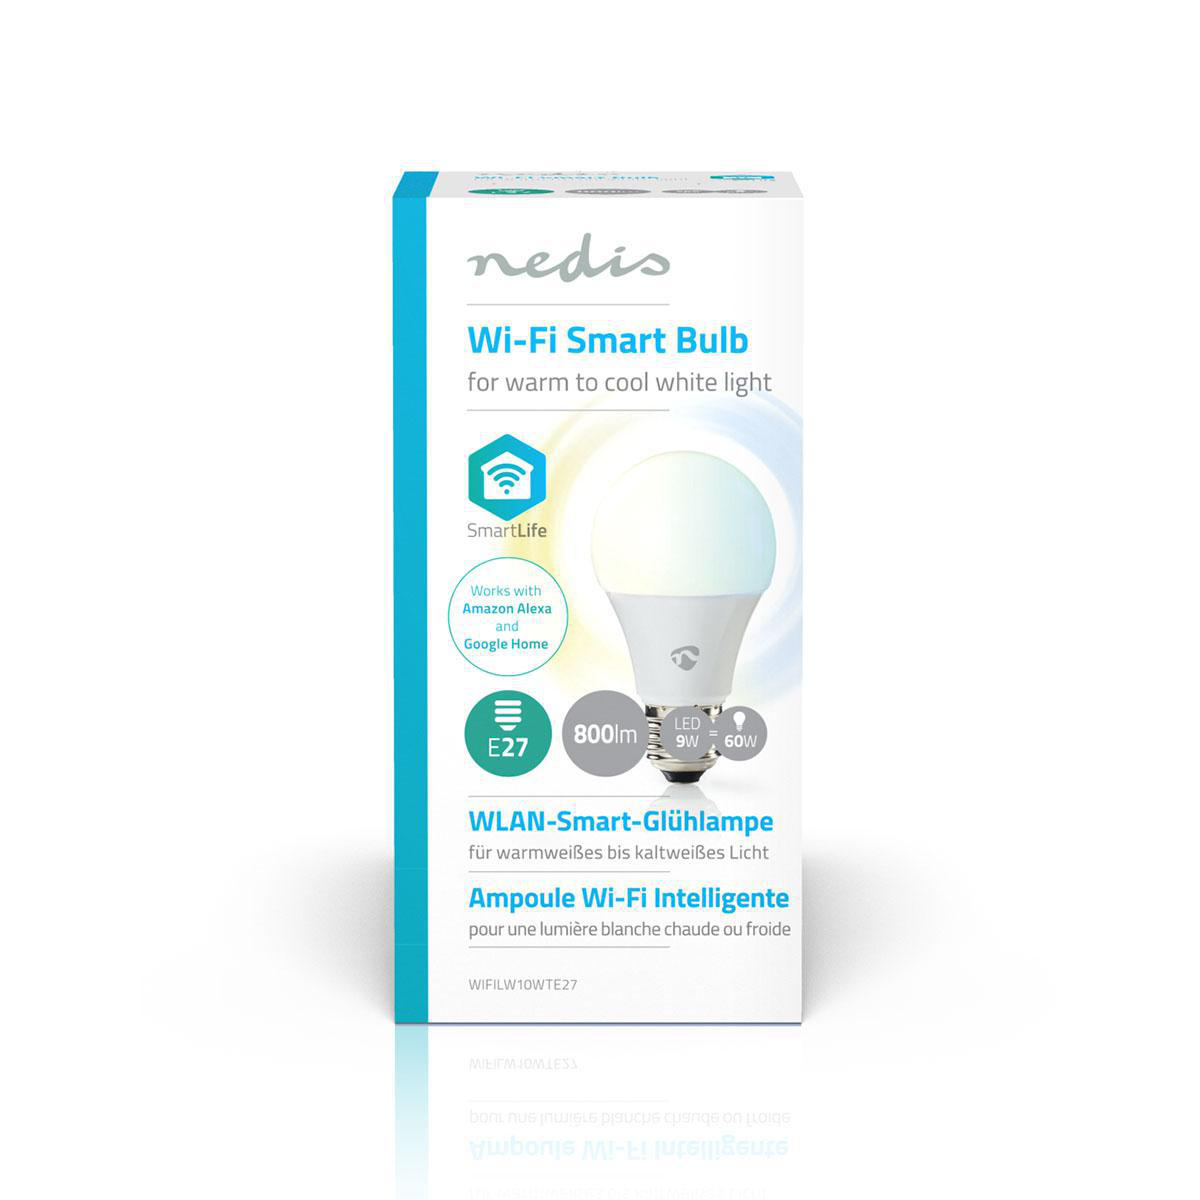 Slimme Wi-Fi Led Lamp 9 Watt CCT - Kleurwissel - voorkant verpakking